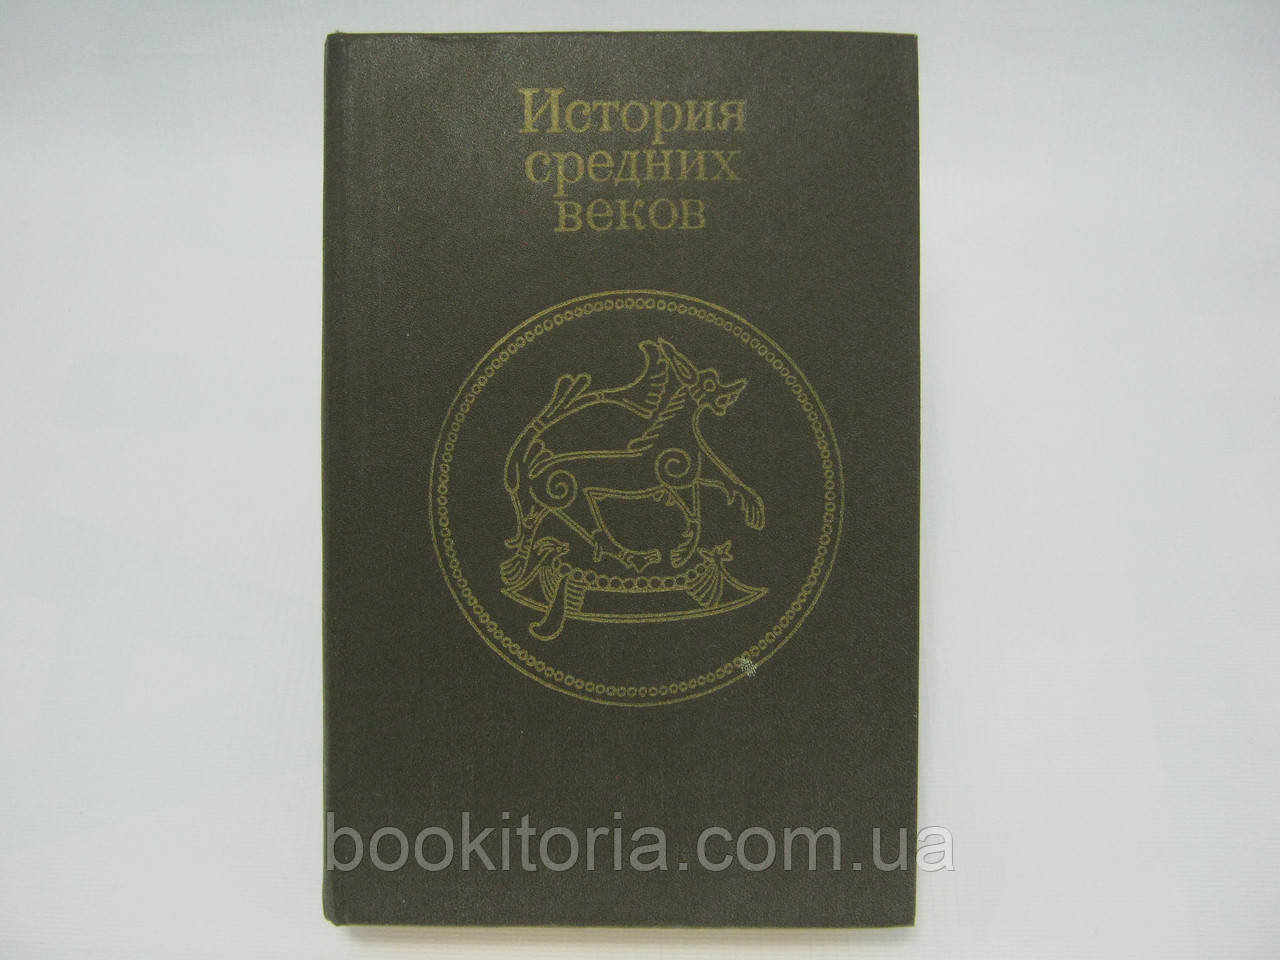 Абрамсон М.Л. и др. История средних веков (б/у).